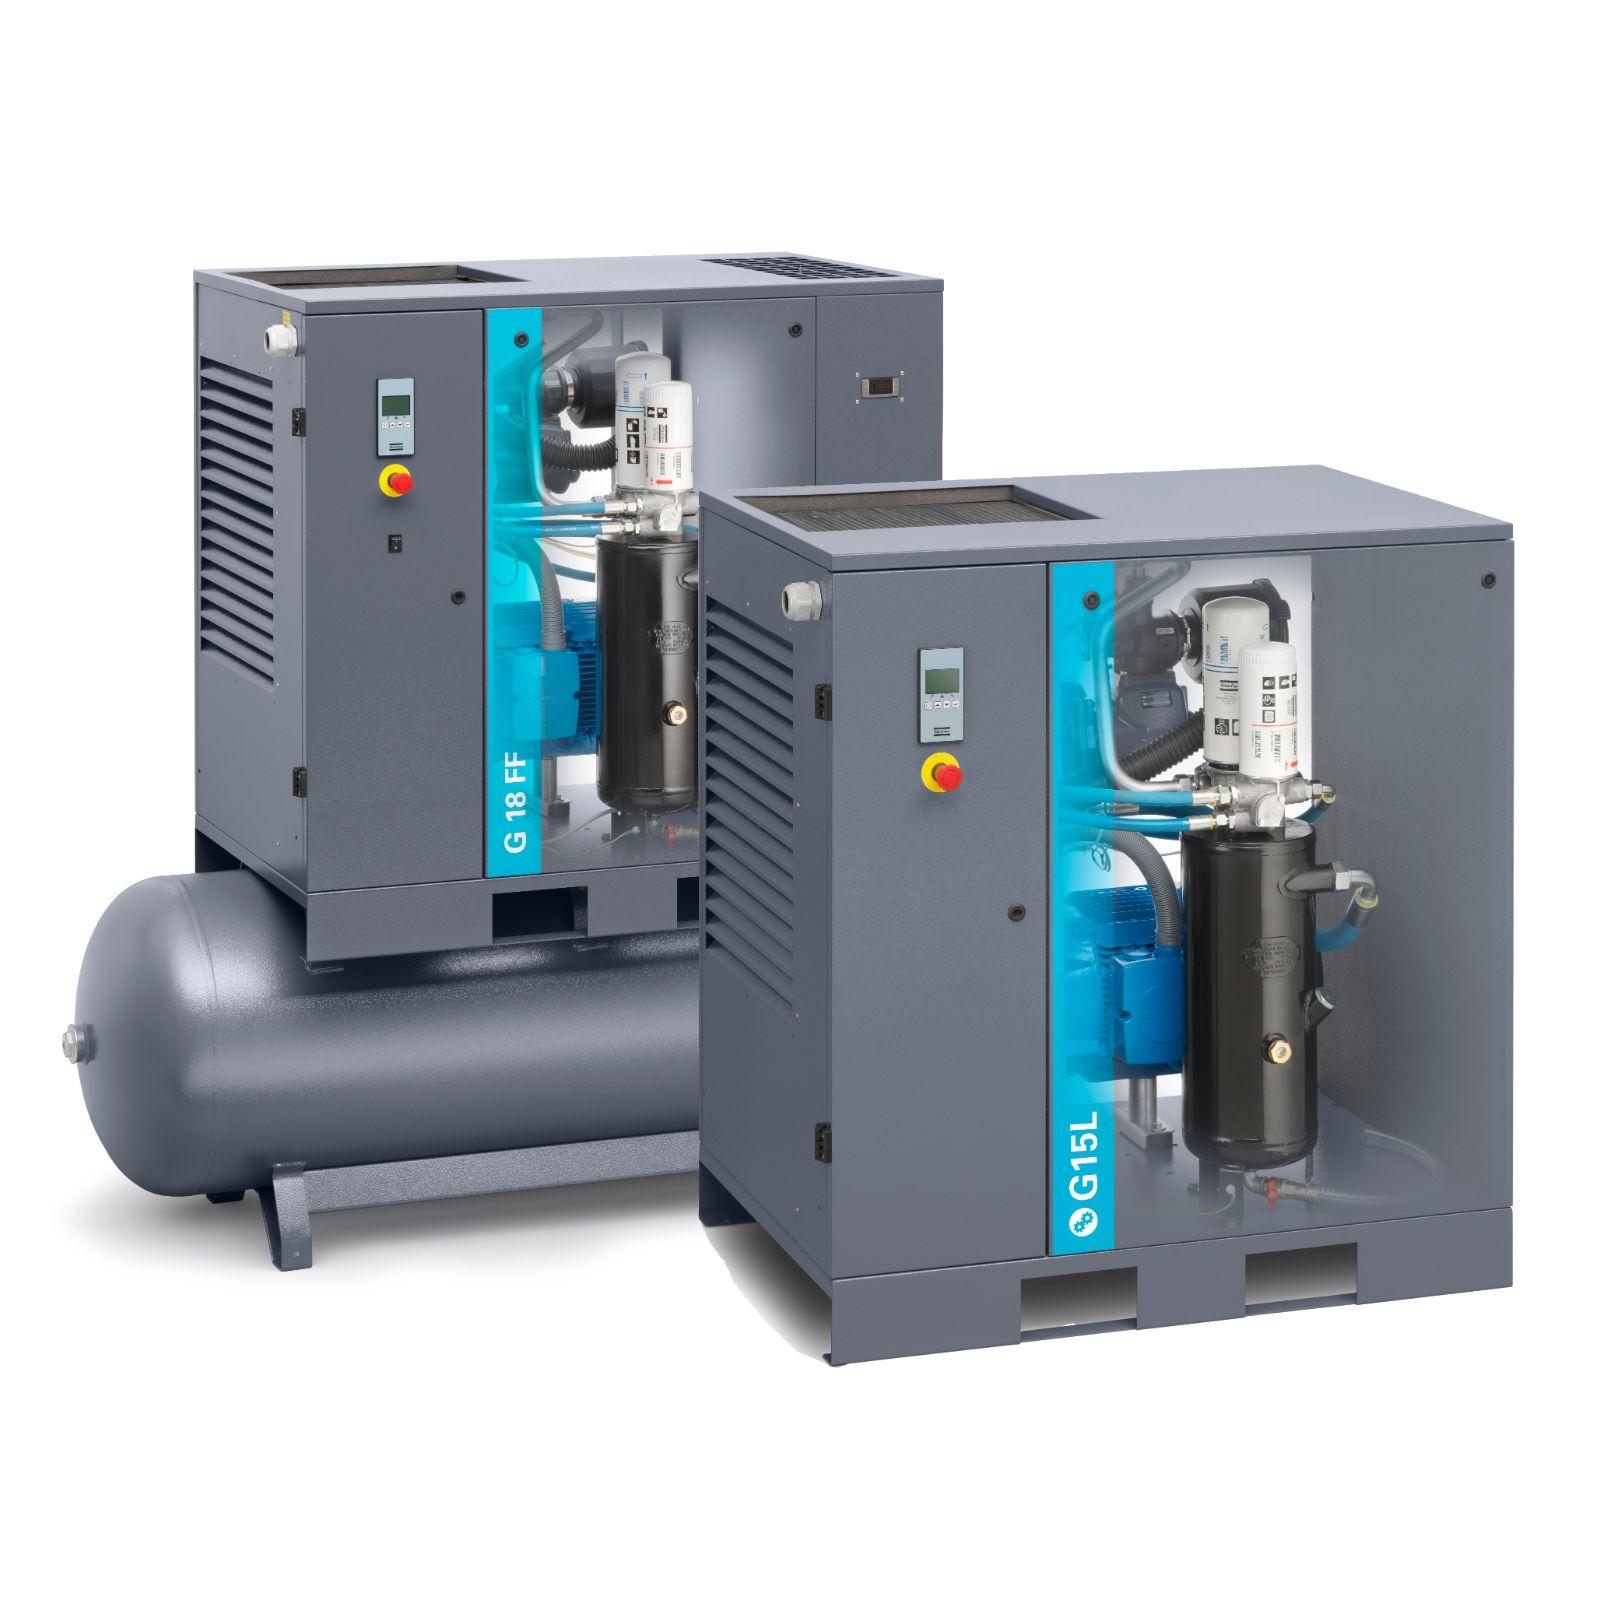 Screw compressor technology explained | Atlas Copco